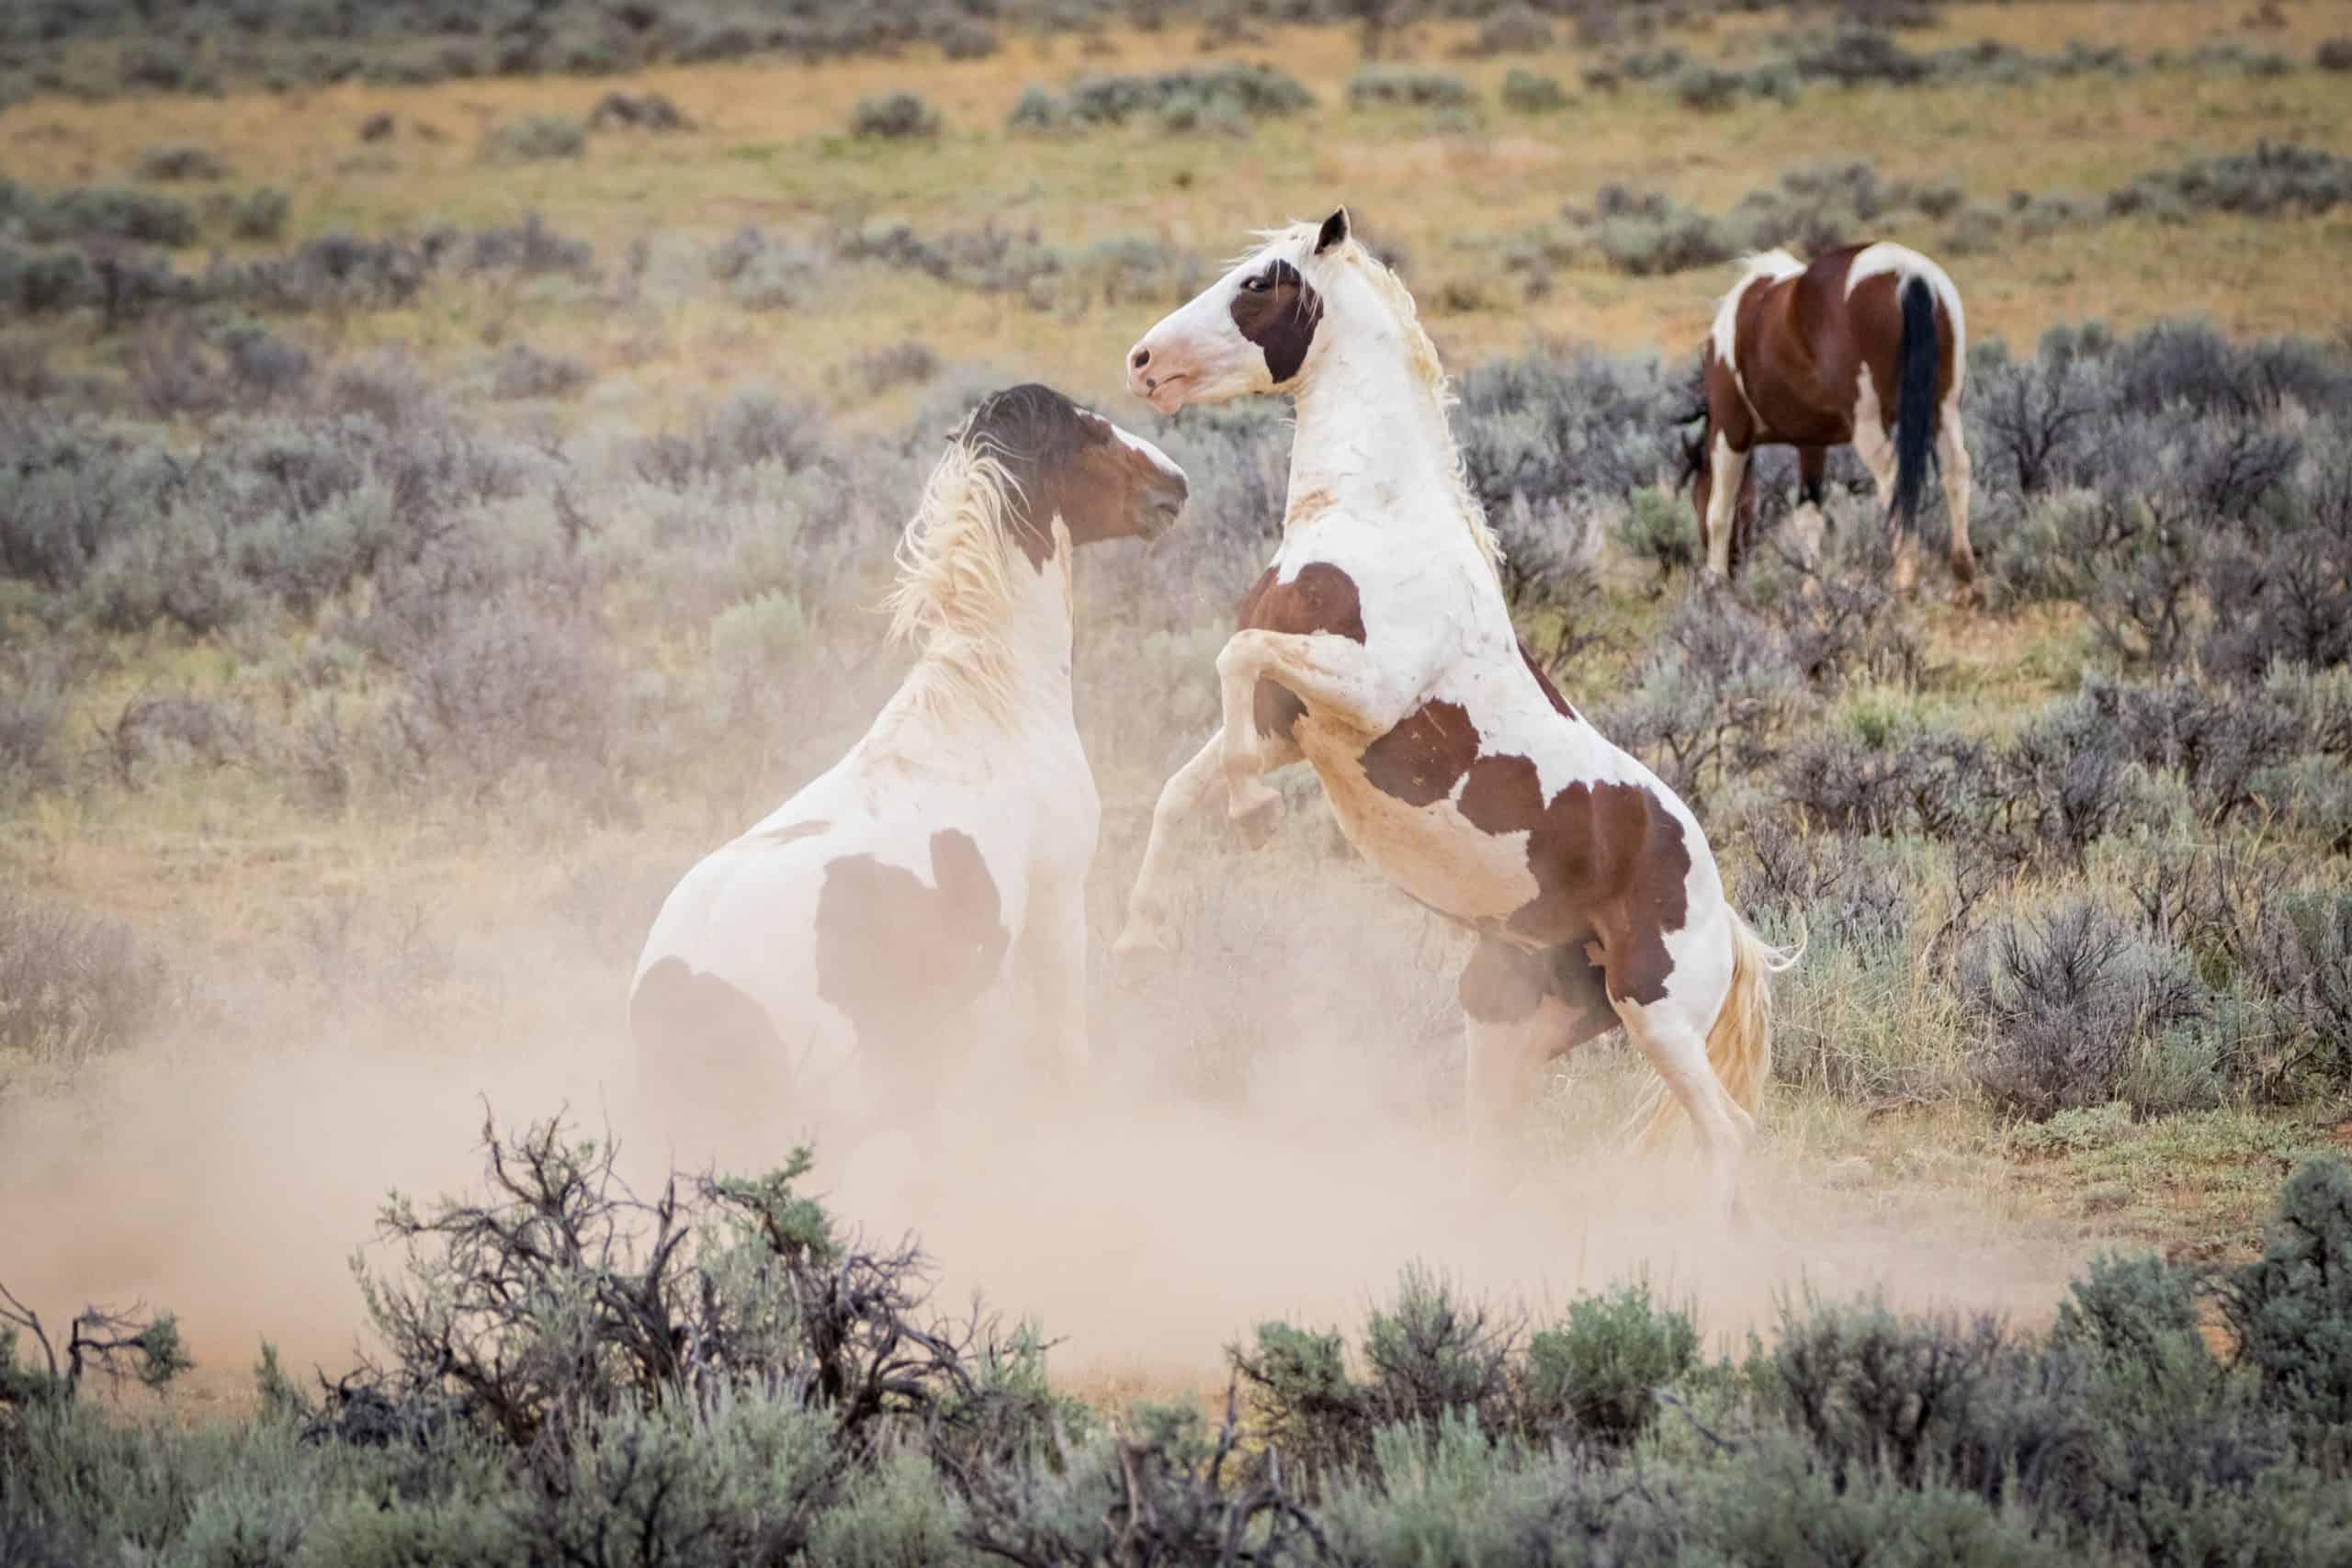 where do wild horses live